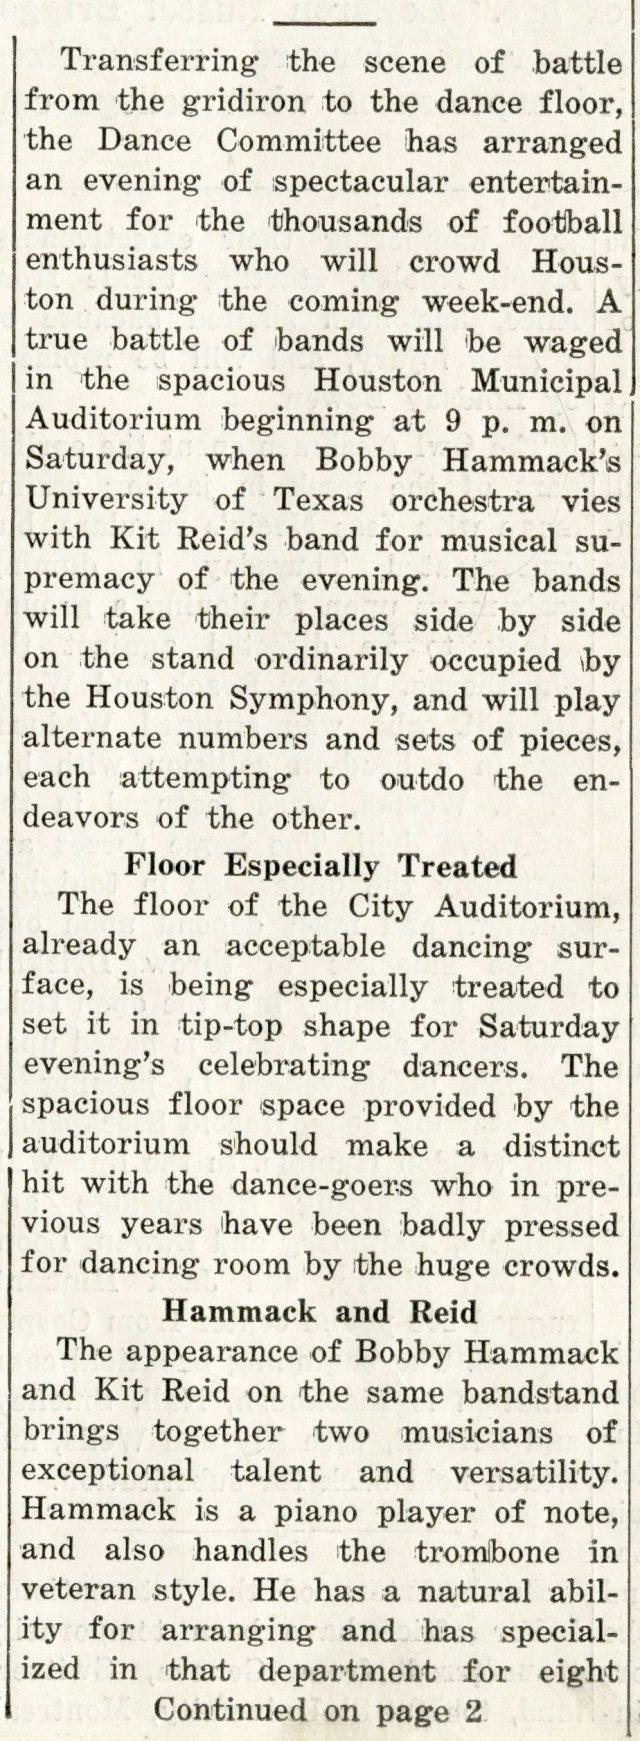 rice-band-1941-campanile-kit-reid-136-copy